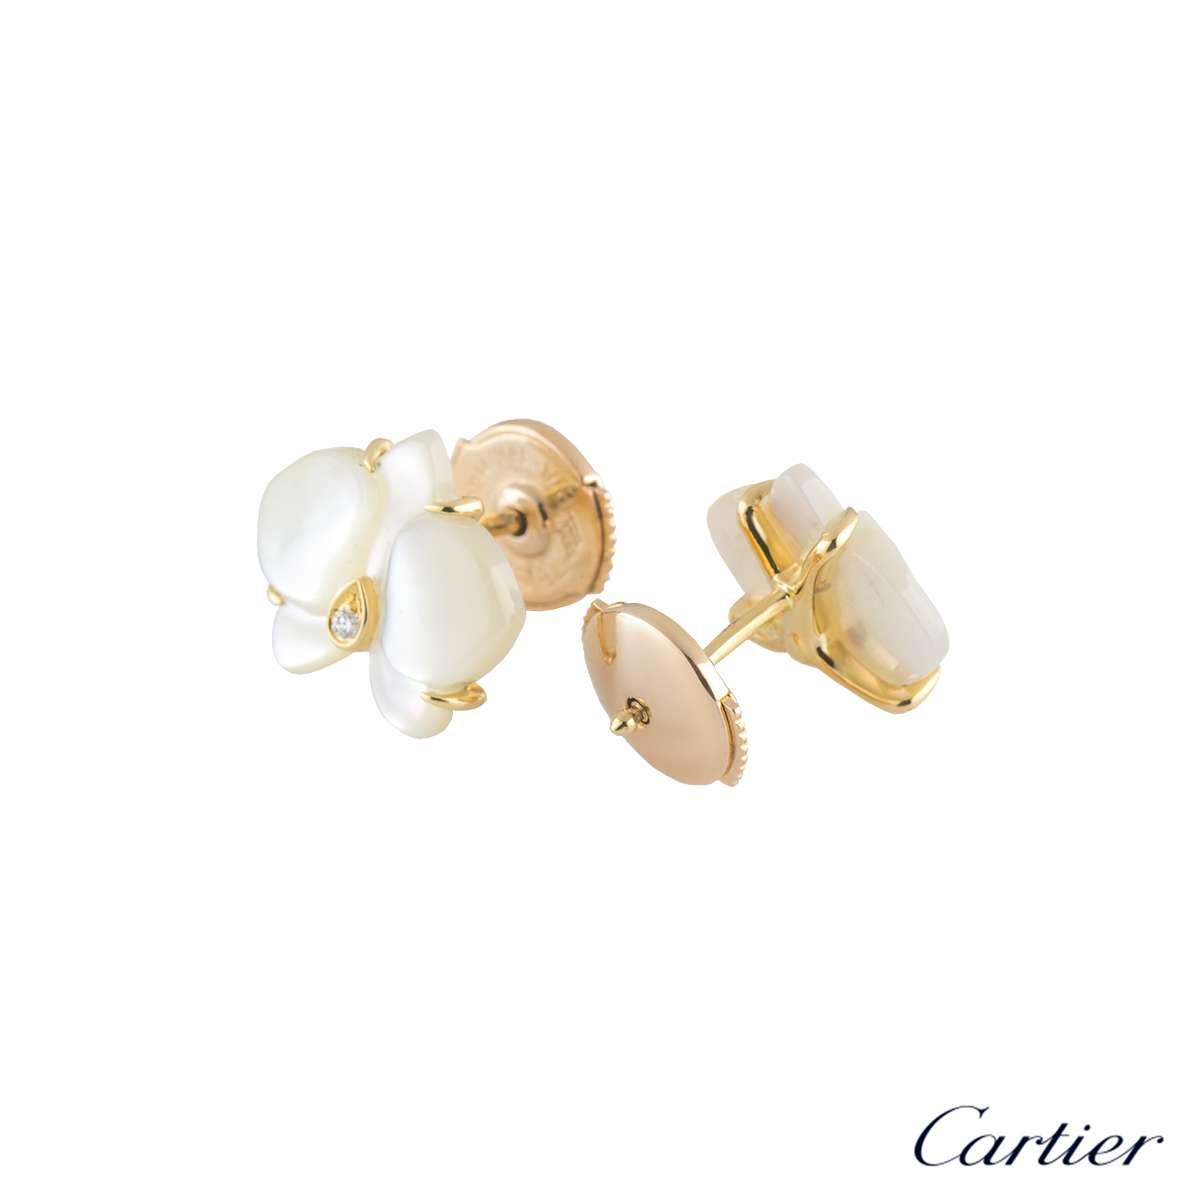 5a0c528ab5d63 Cartier Caresse Earrings